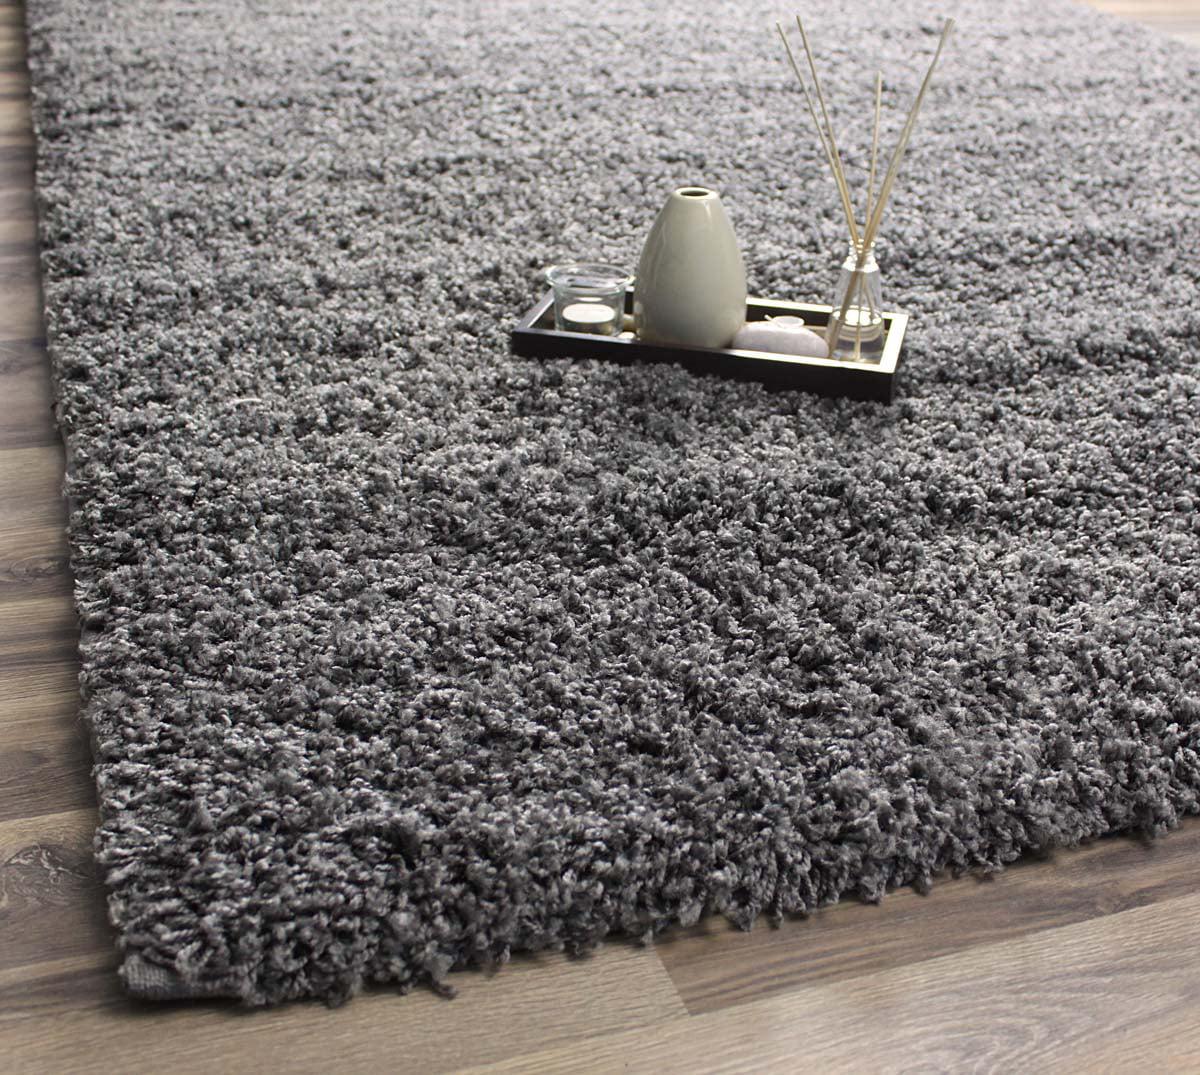 super area rugs cozy plush solid gray shag rug  ' x   - super area rugs cozy plush solid gray shag rug  ' x '  walmartcom